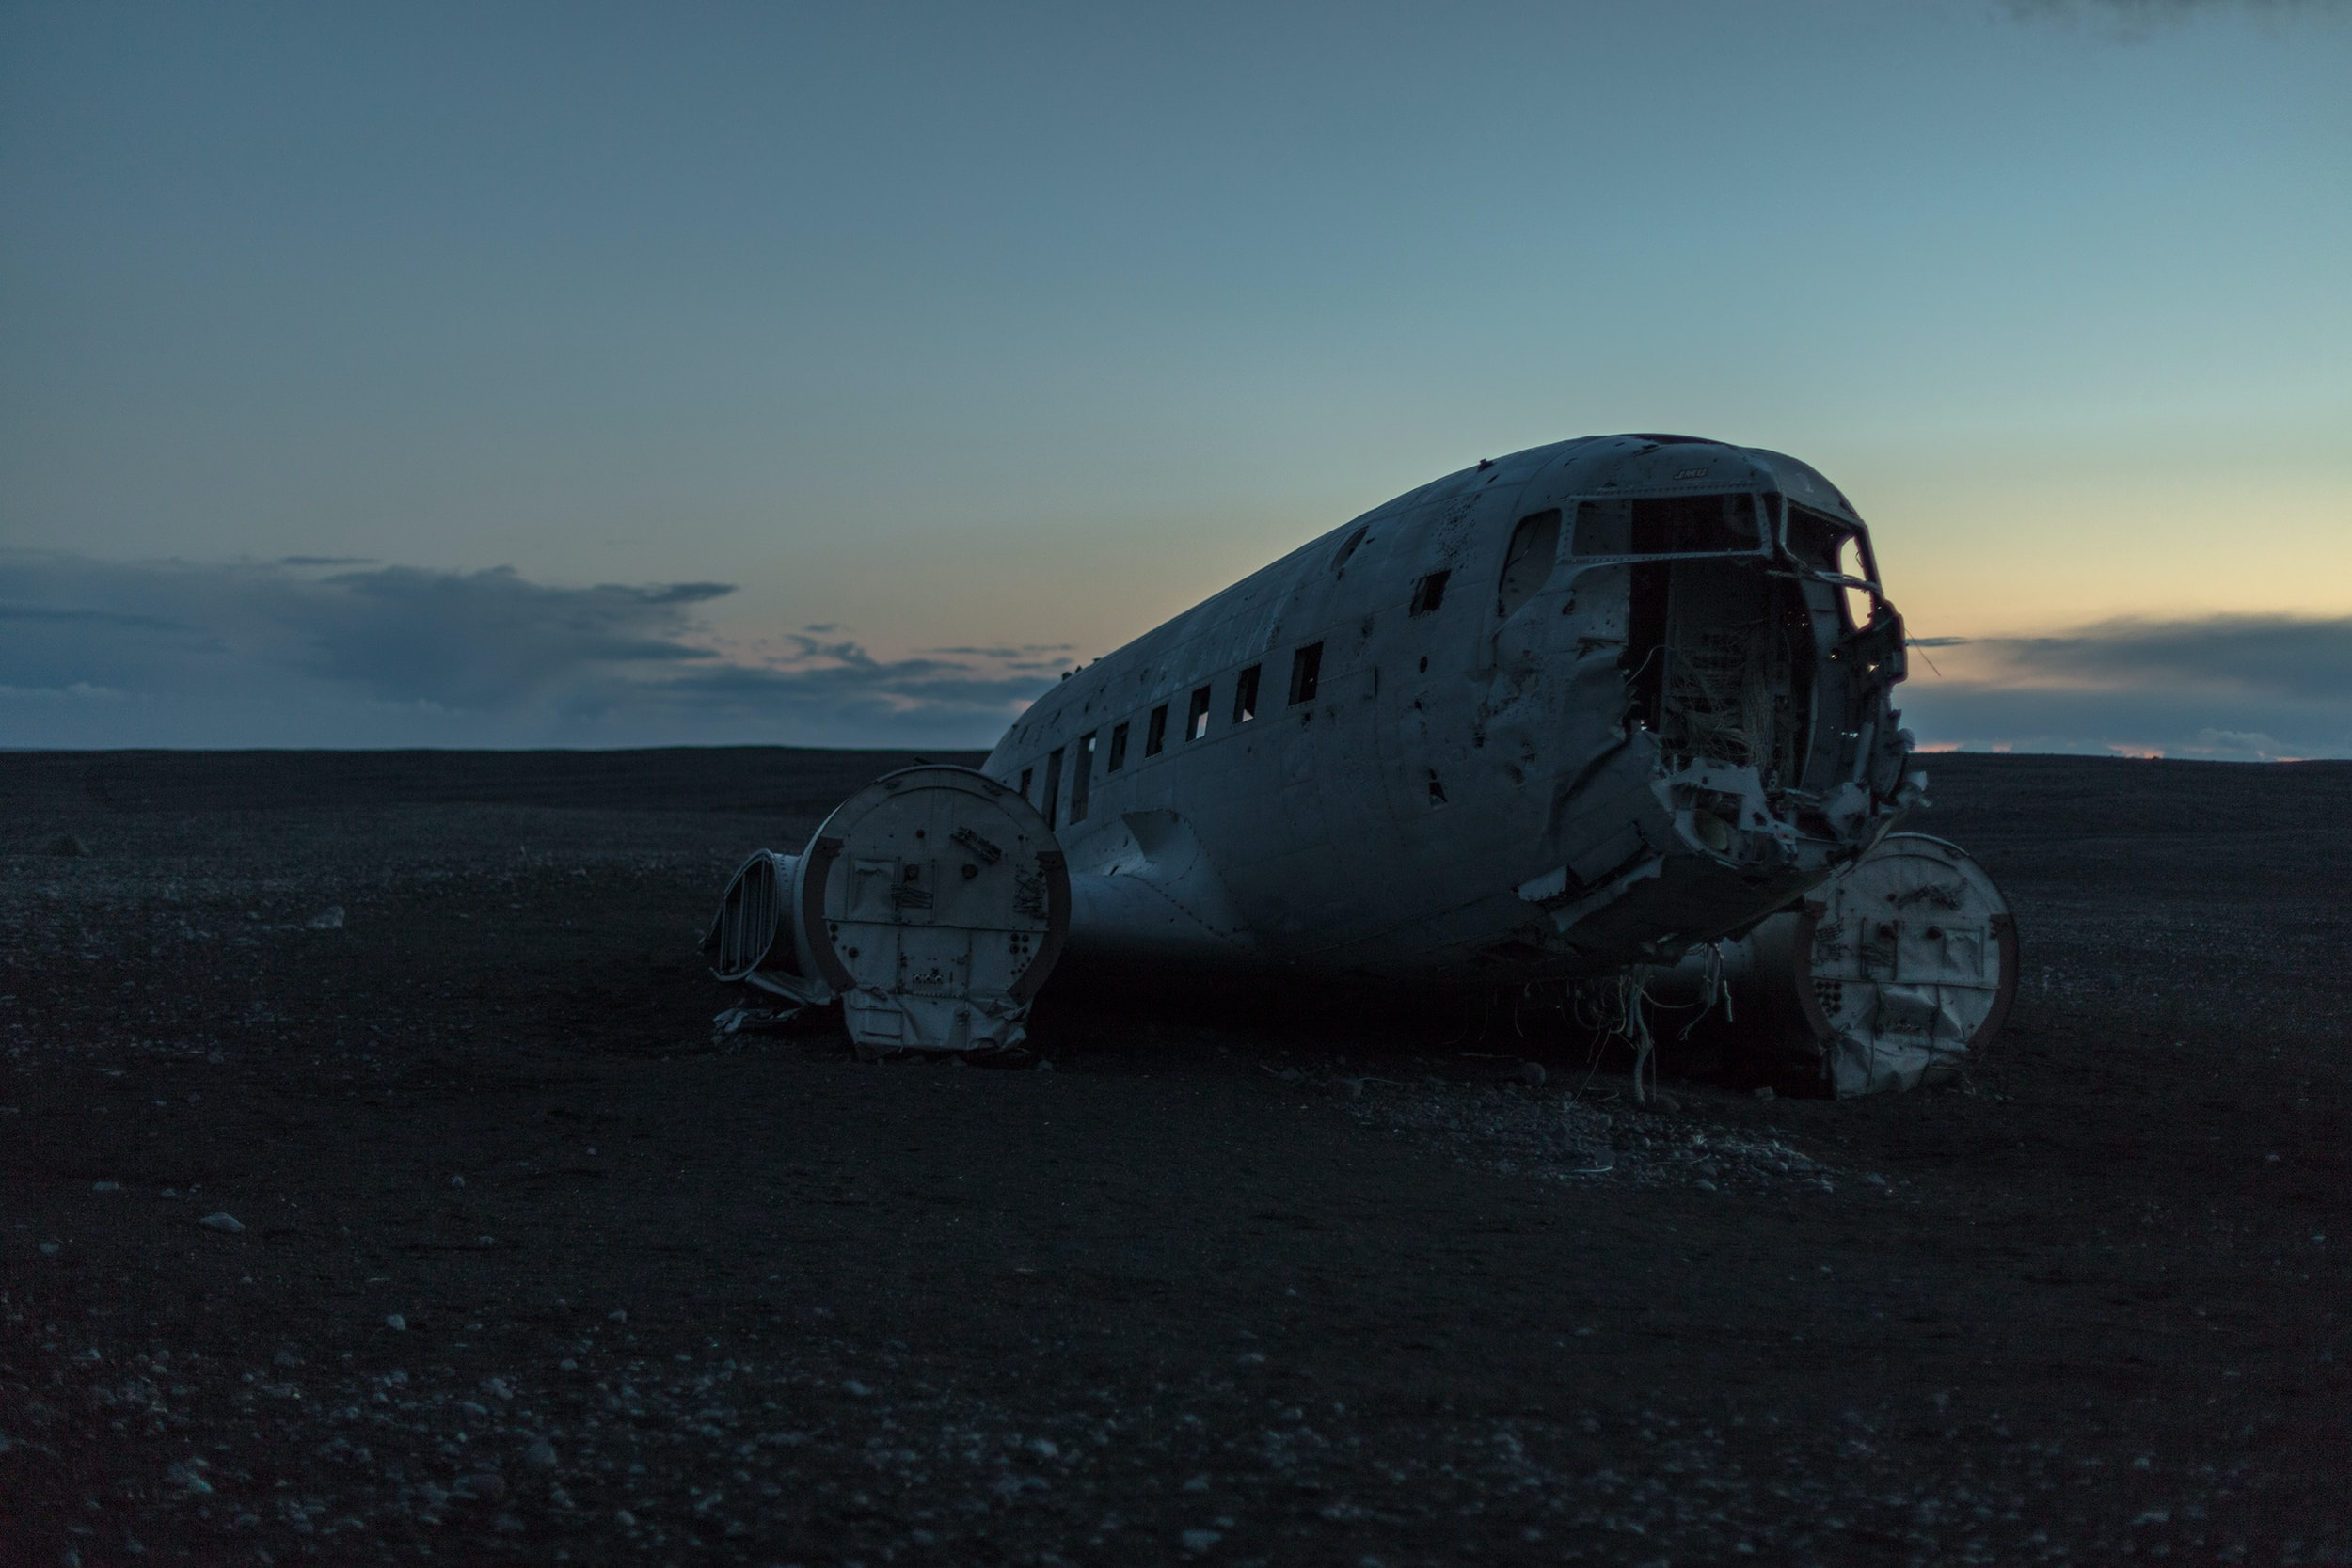 photo of abandoned plane on soil